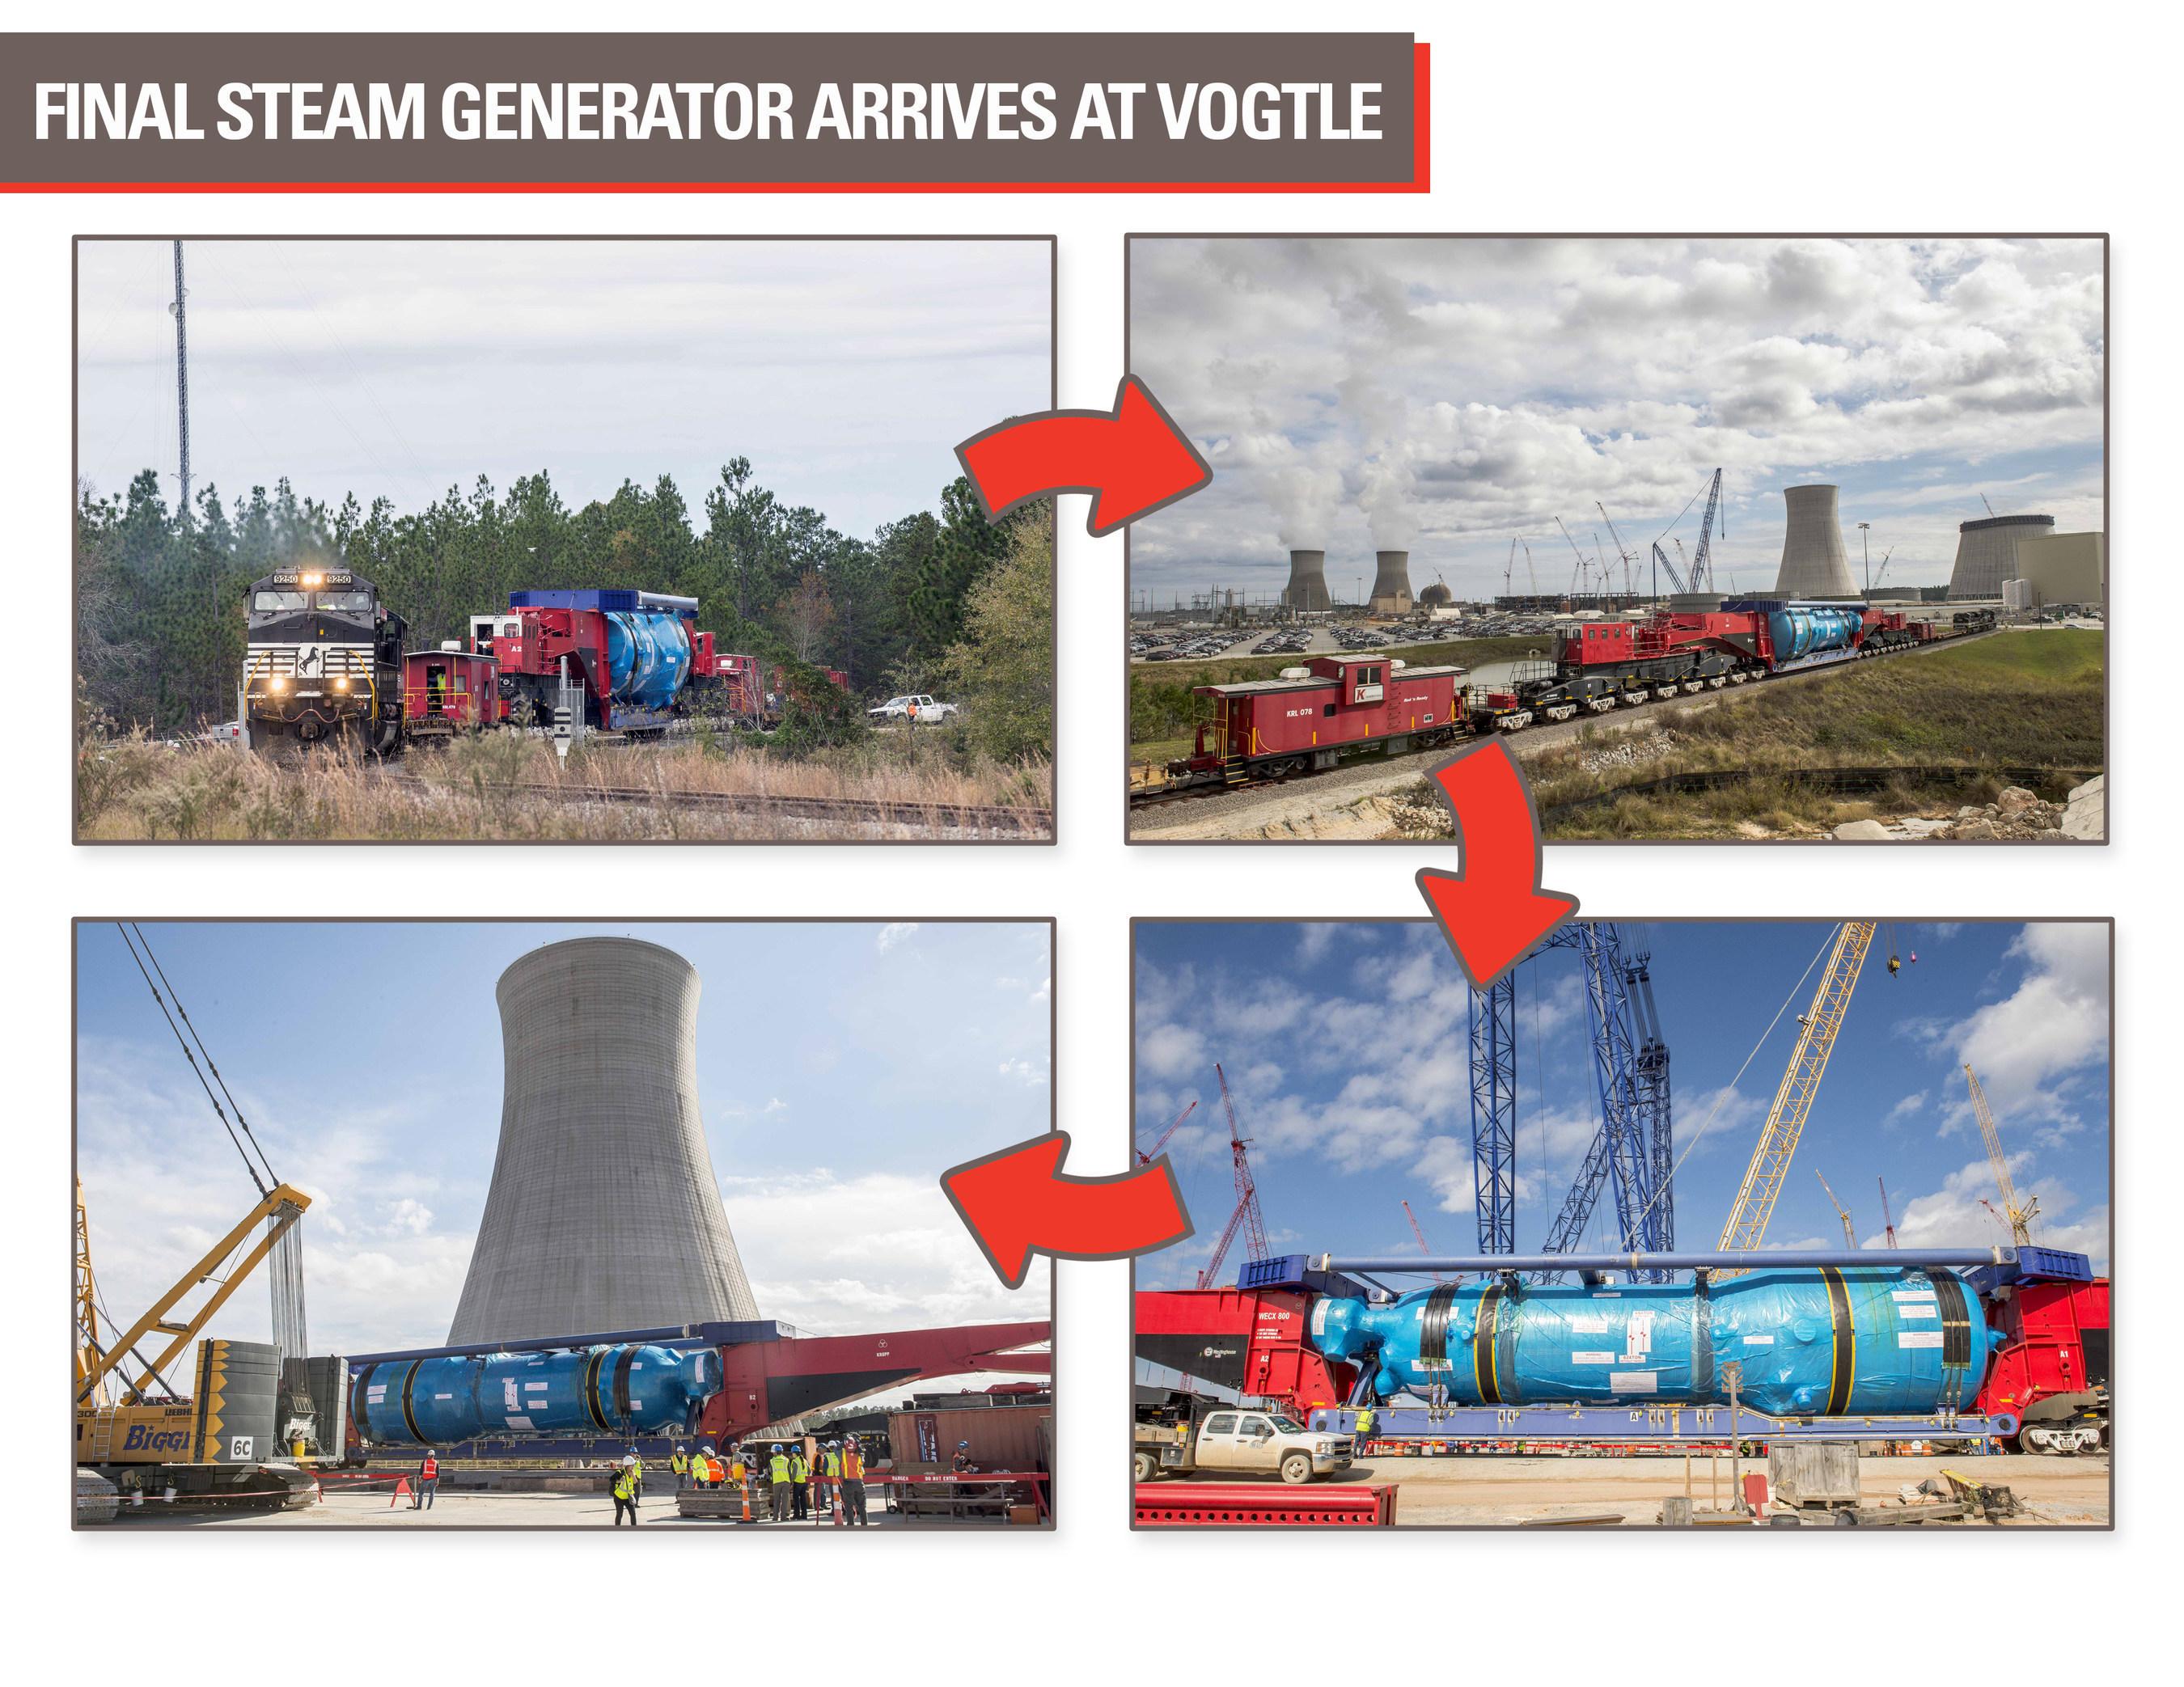 Final 1.3 million-pound steam generator arrives at the Plant Vogtle nuclear power construction site.